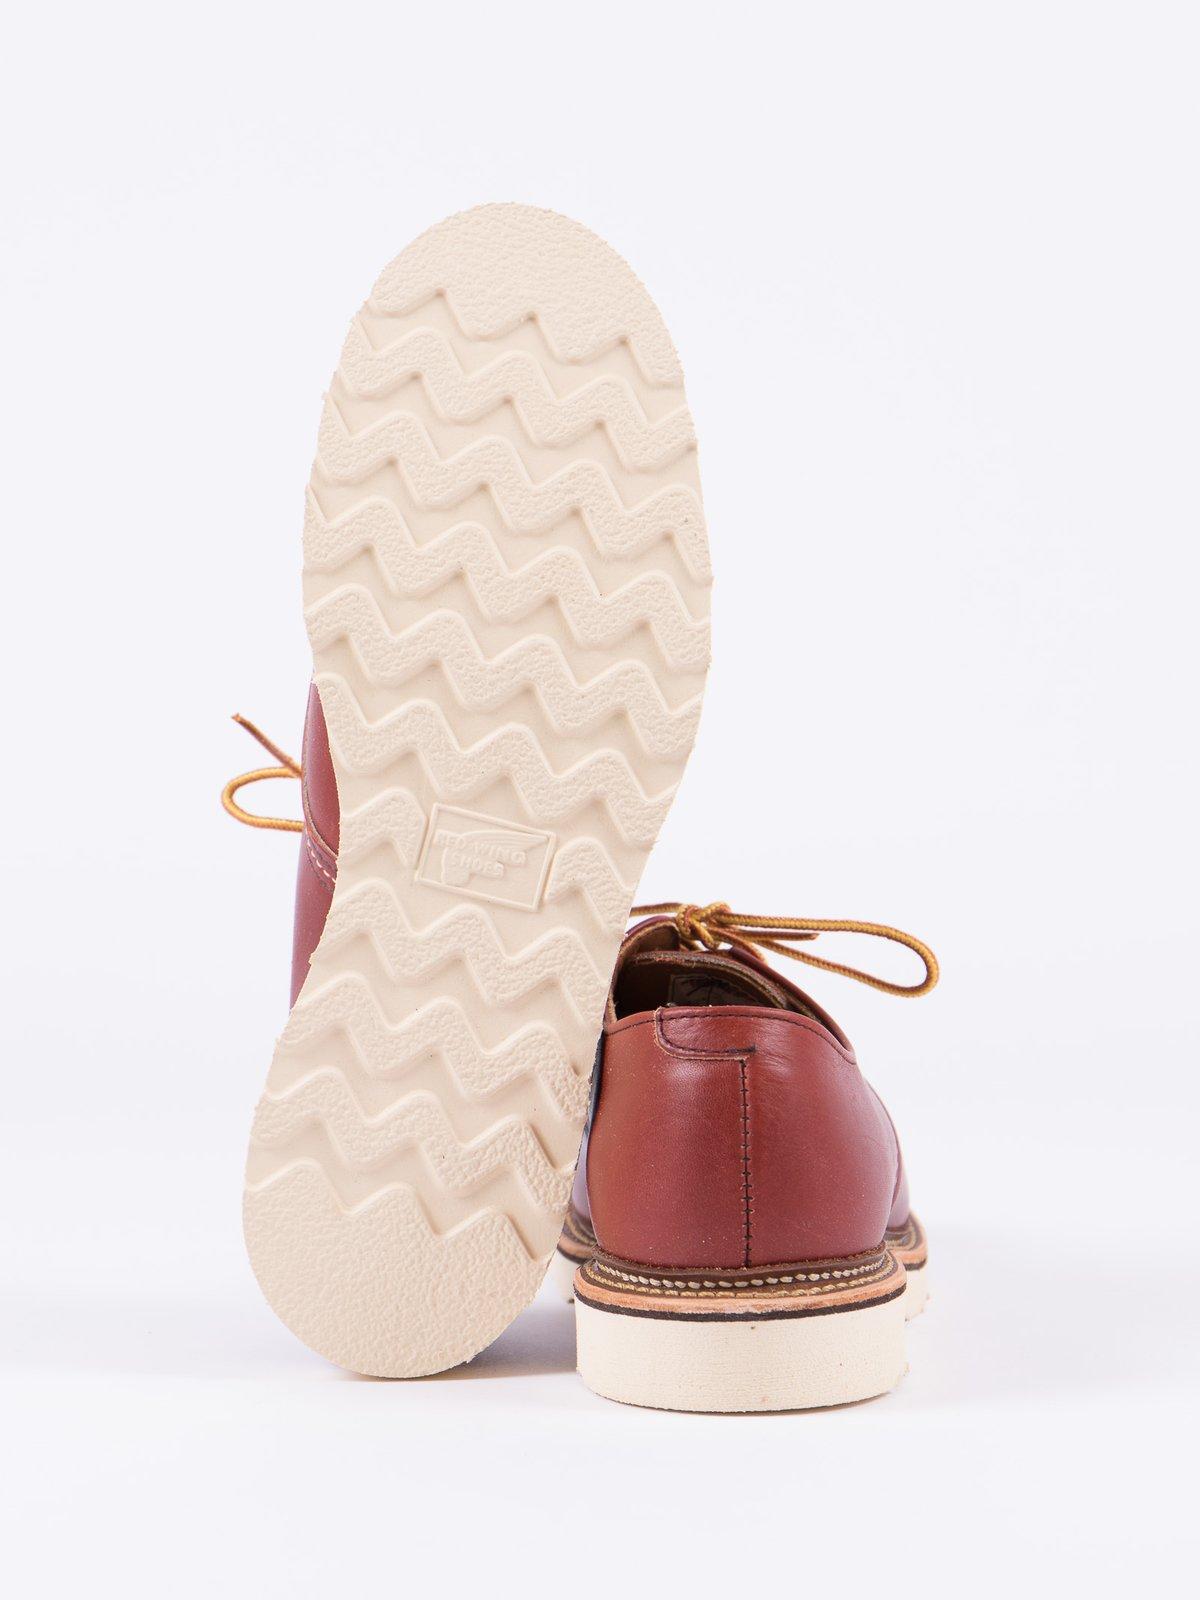 Oro Russet Portage 8103 Classic Oxford Shoe - Image 4